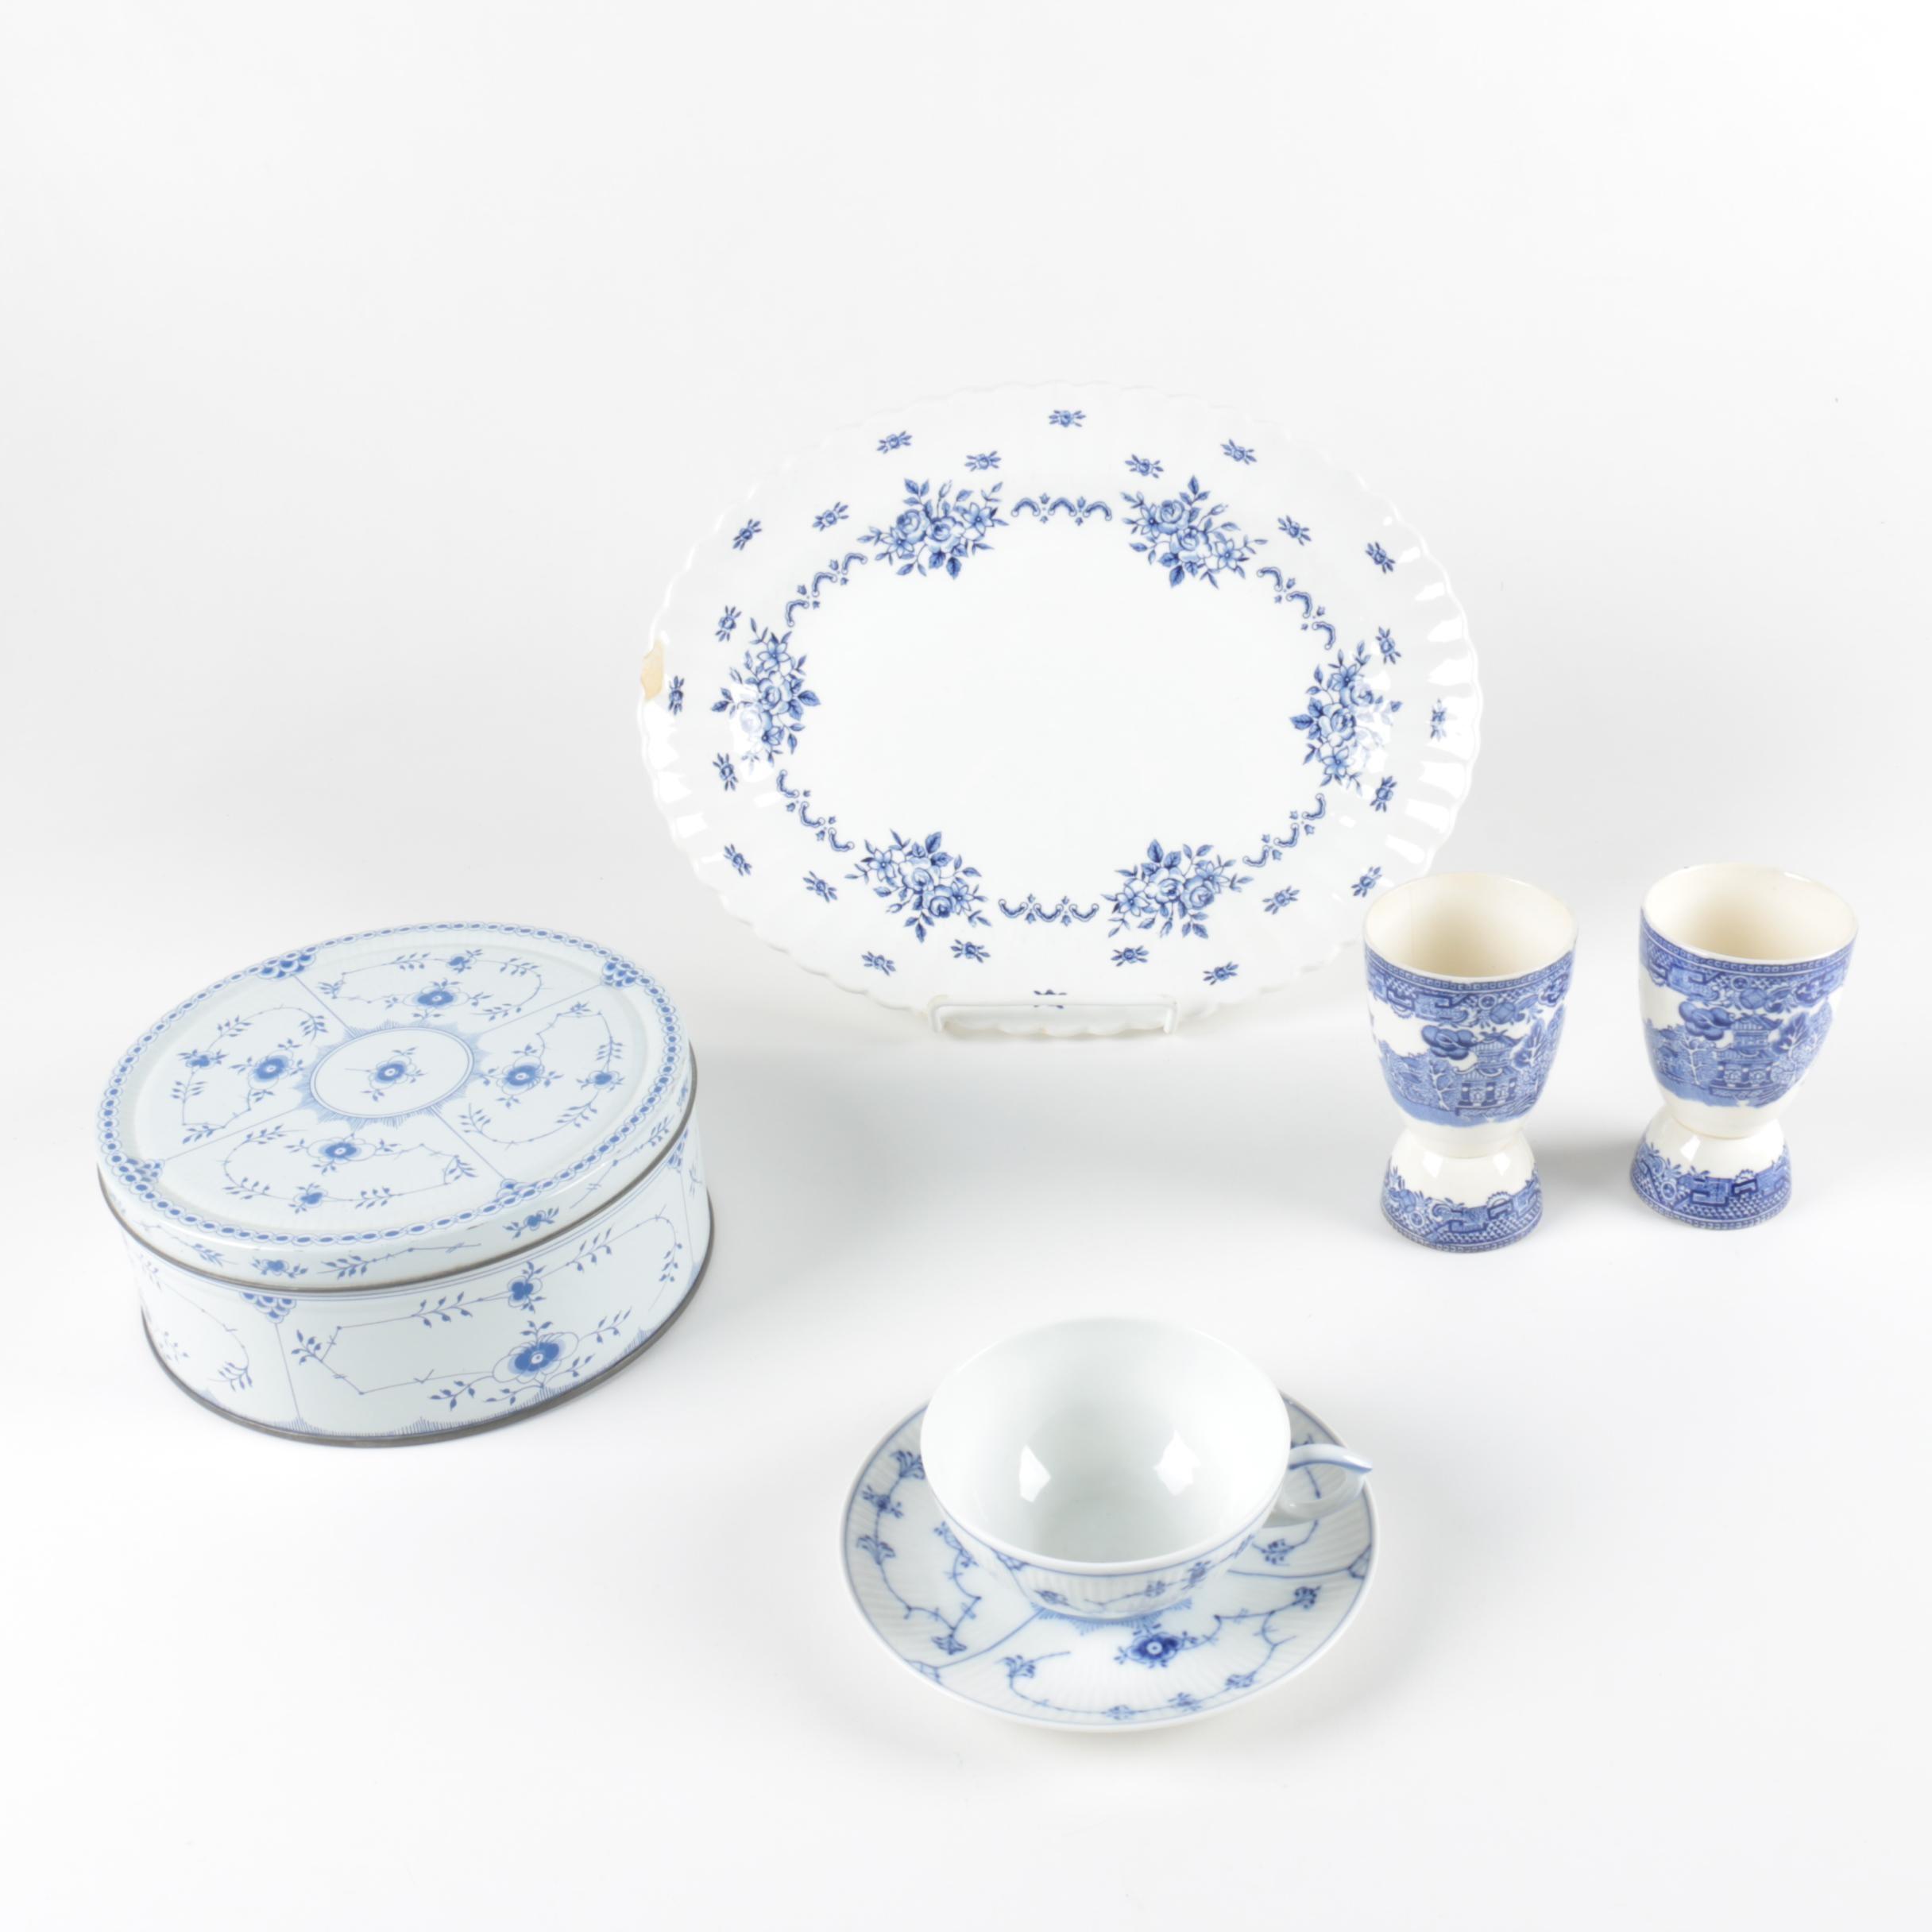 Blue and White Tableware including Royal Copenhagen and JG Meakin ...  sc 1 st  EBTH.com & Blue and White Tableware including Royal Copenhagen and JG Meakin : EBTH